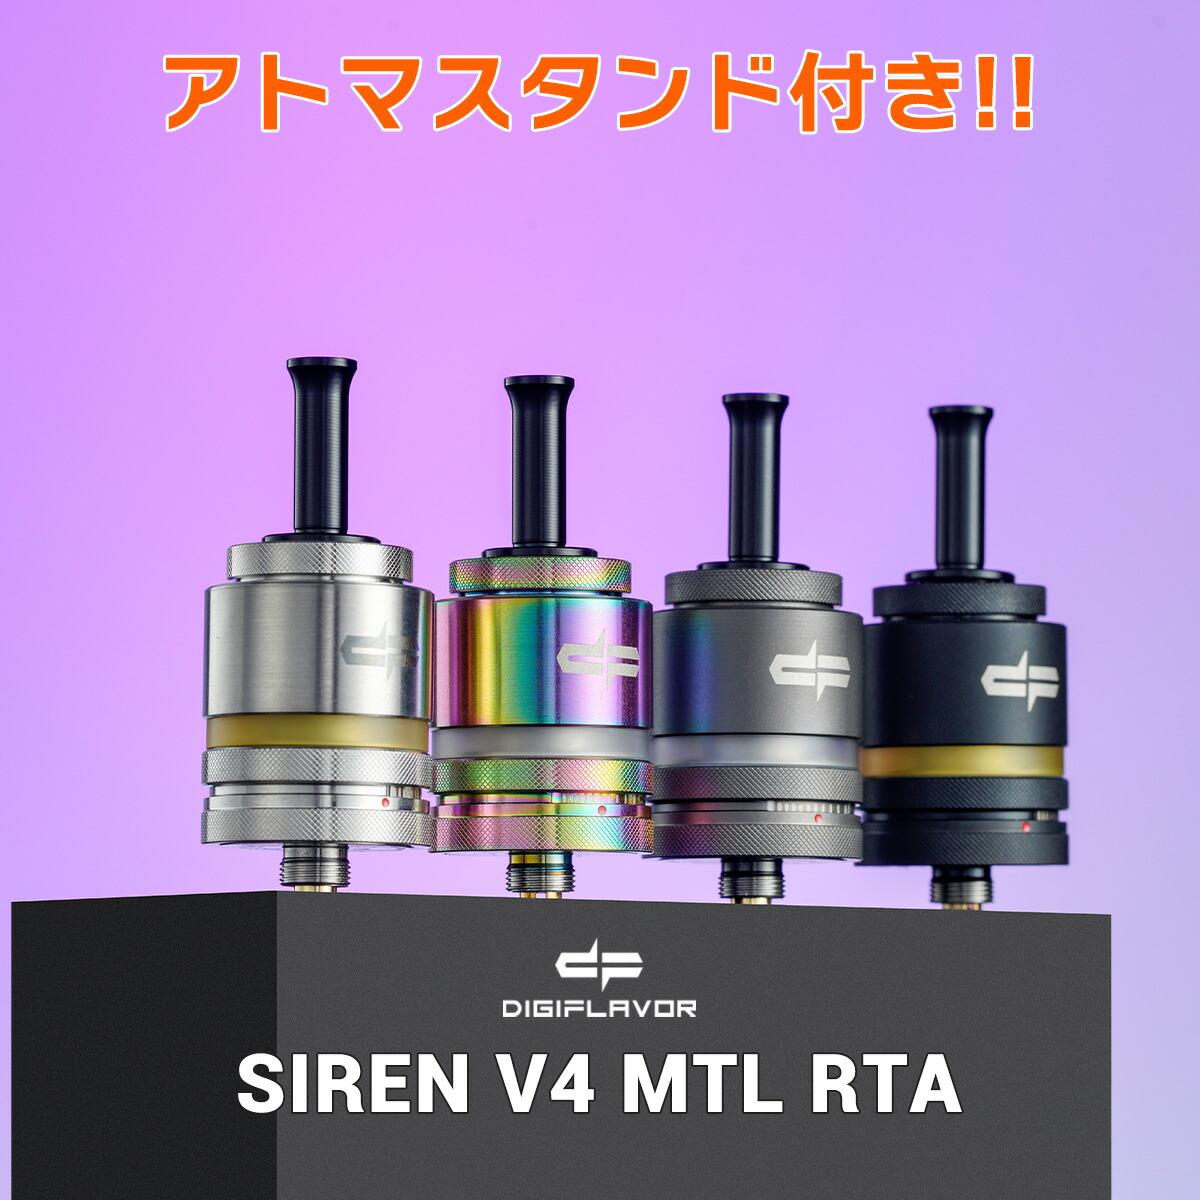 Digiflavor SIREN V4 MTL RTA デジフレーバー サイレン V4 MTL RTA 電子タバコ vape アトマイザー RTA 直径 22mm シングル MTL 味重視 Digiflavor GTA SIREN V4 S4 RTA